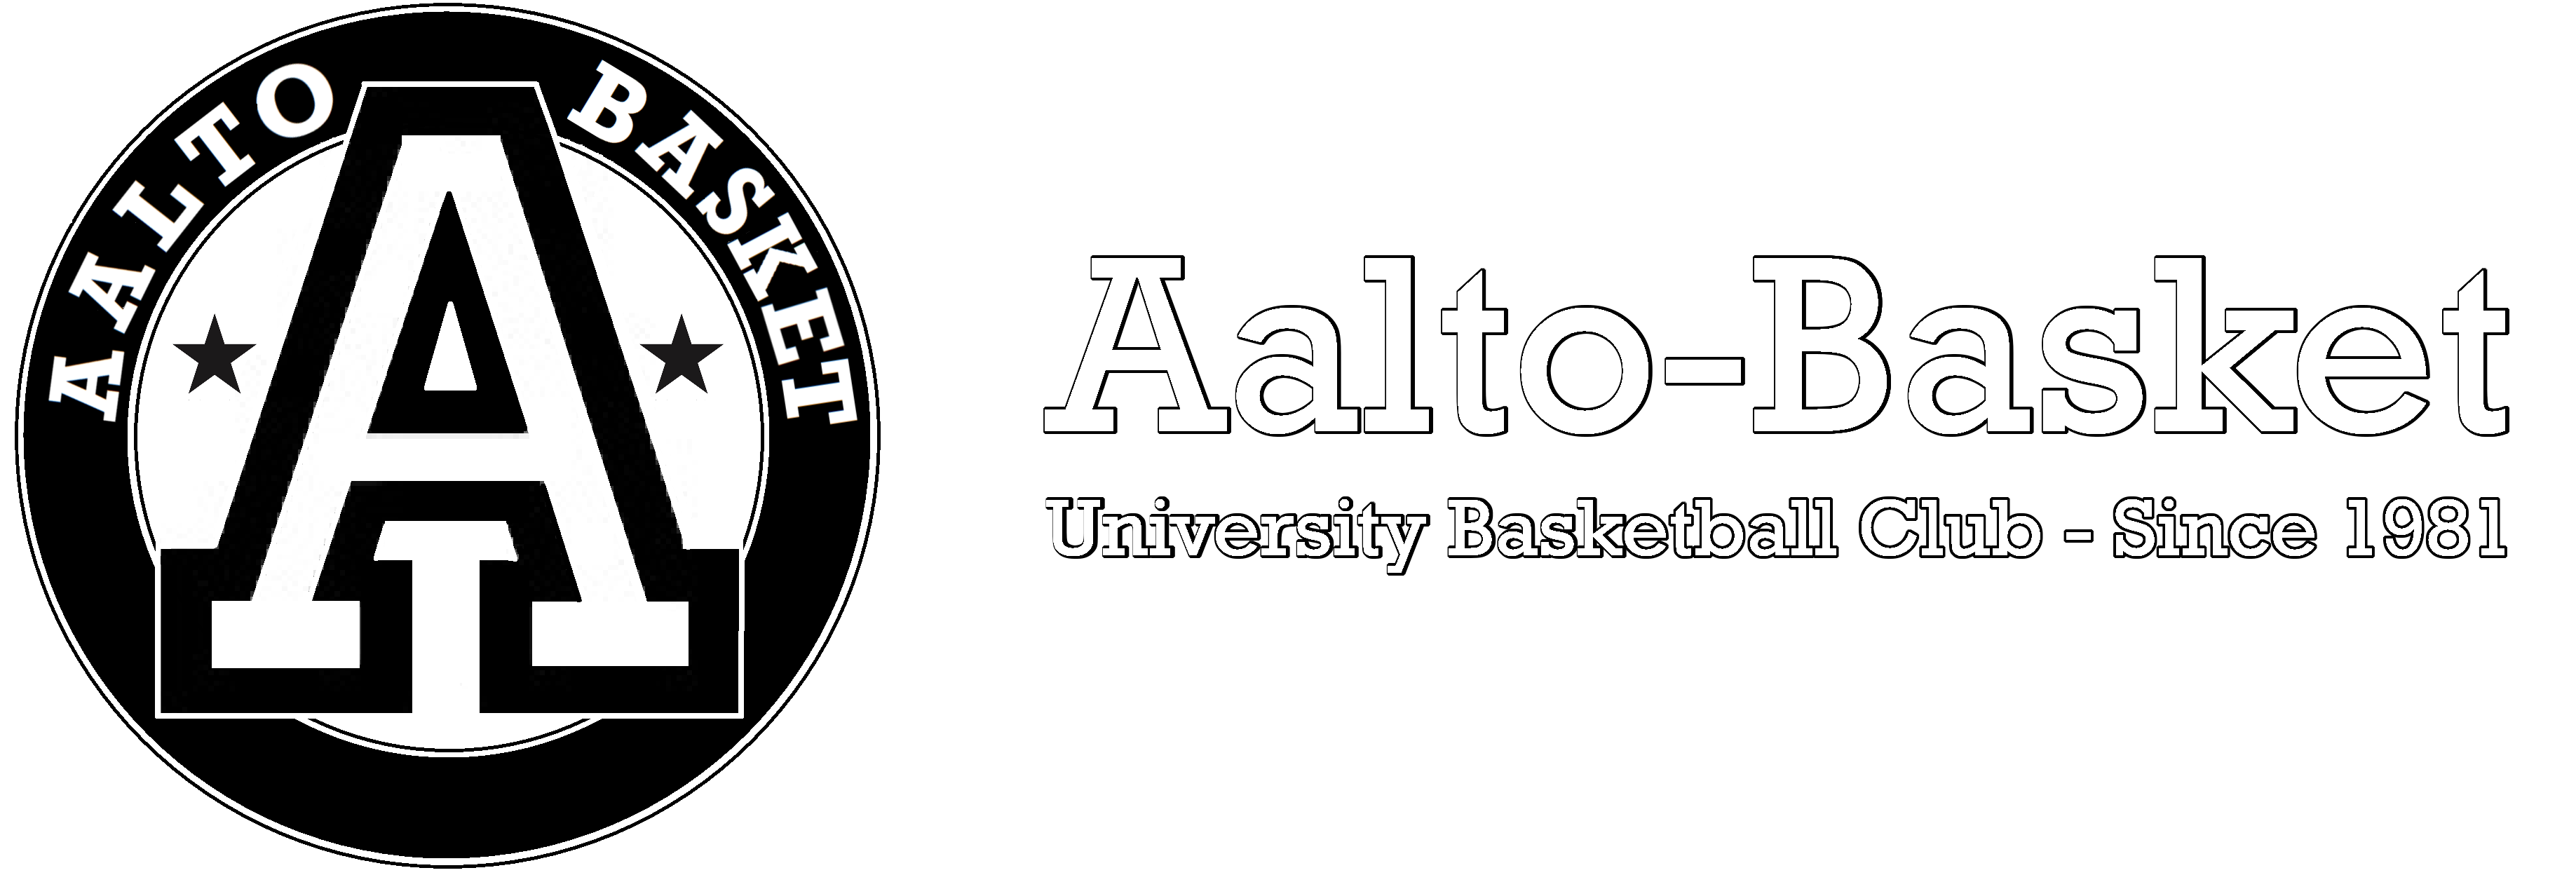 Aalto-Basket